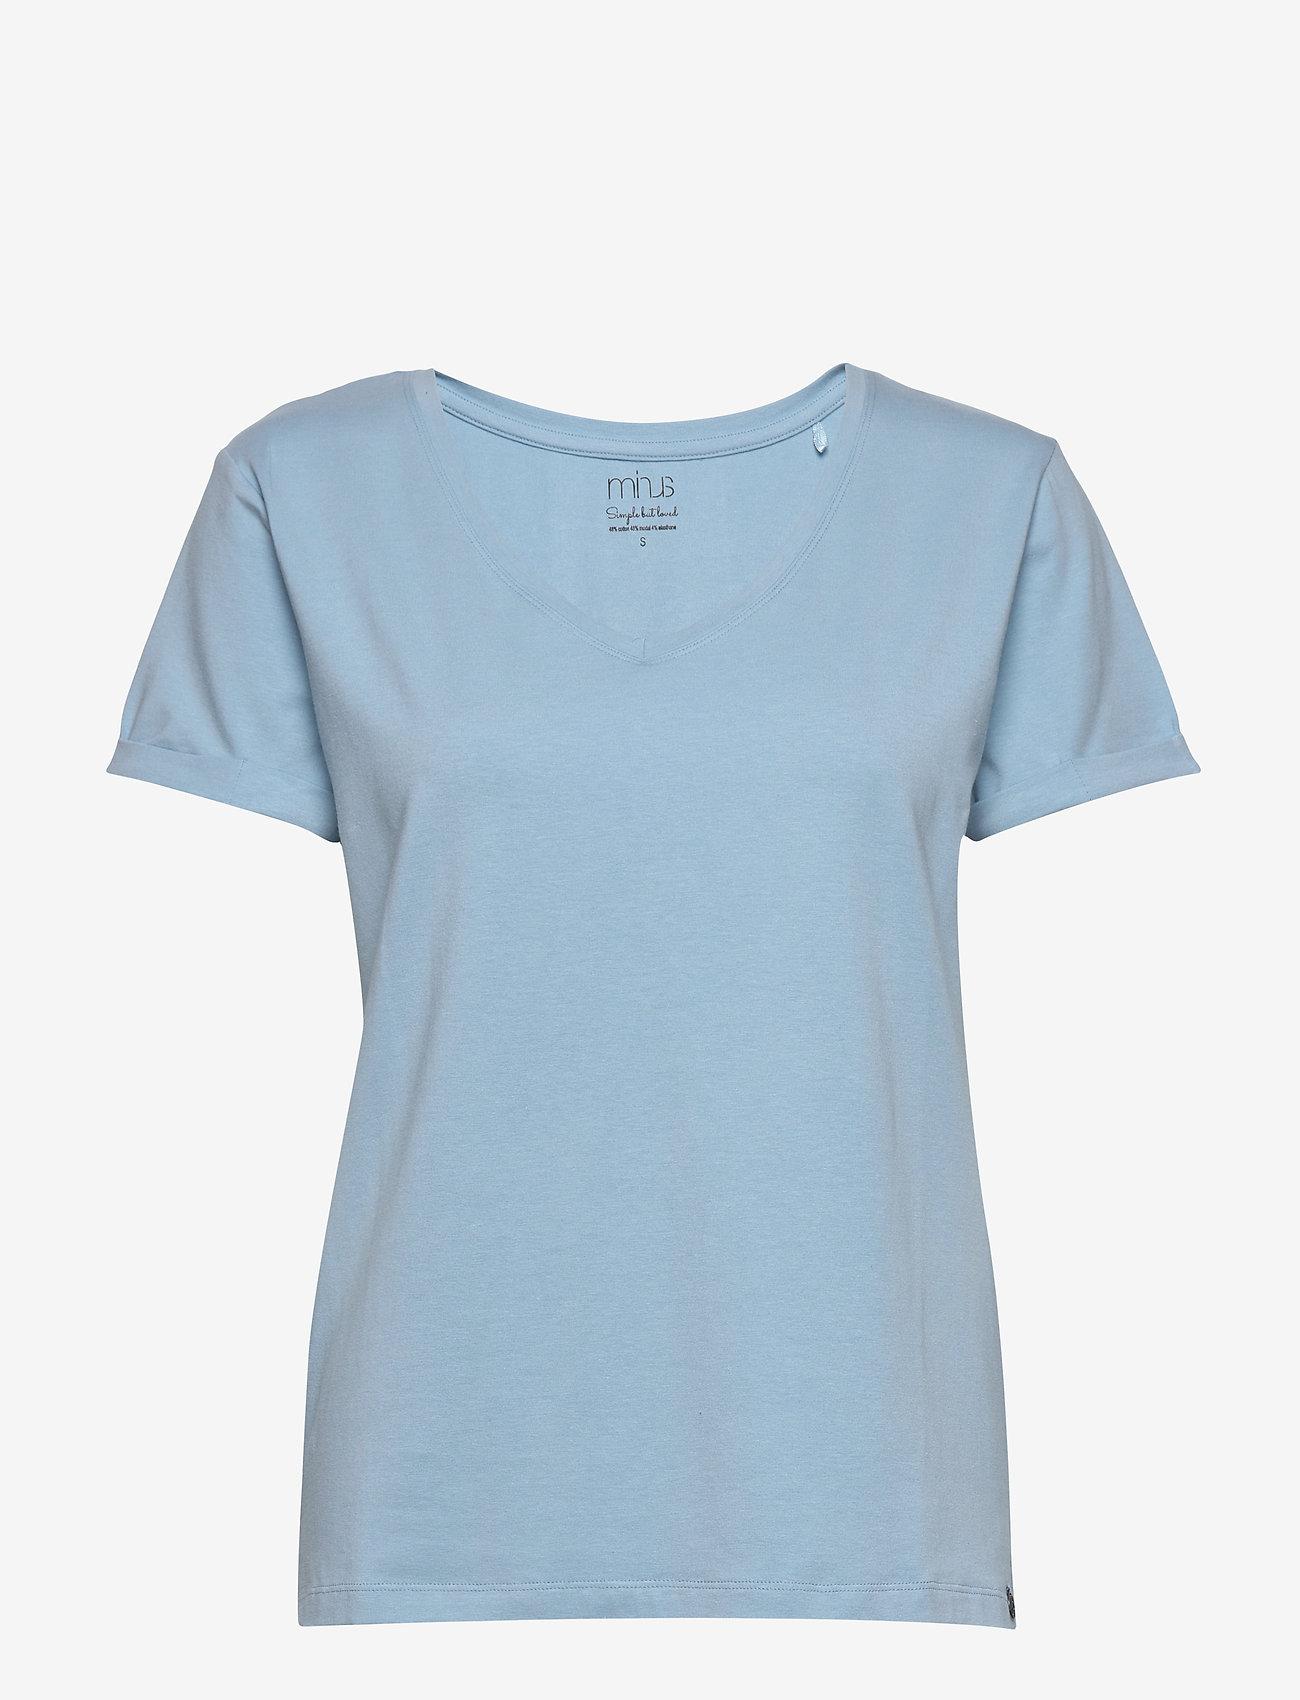 Minus - Adele tee - t-shirts - bounty blue - 0